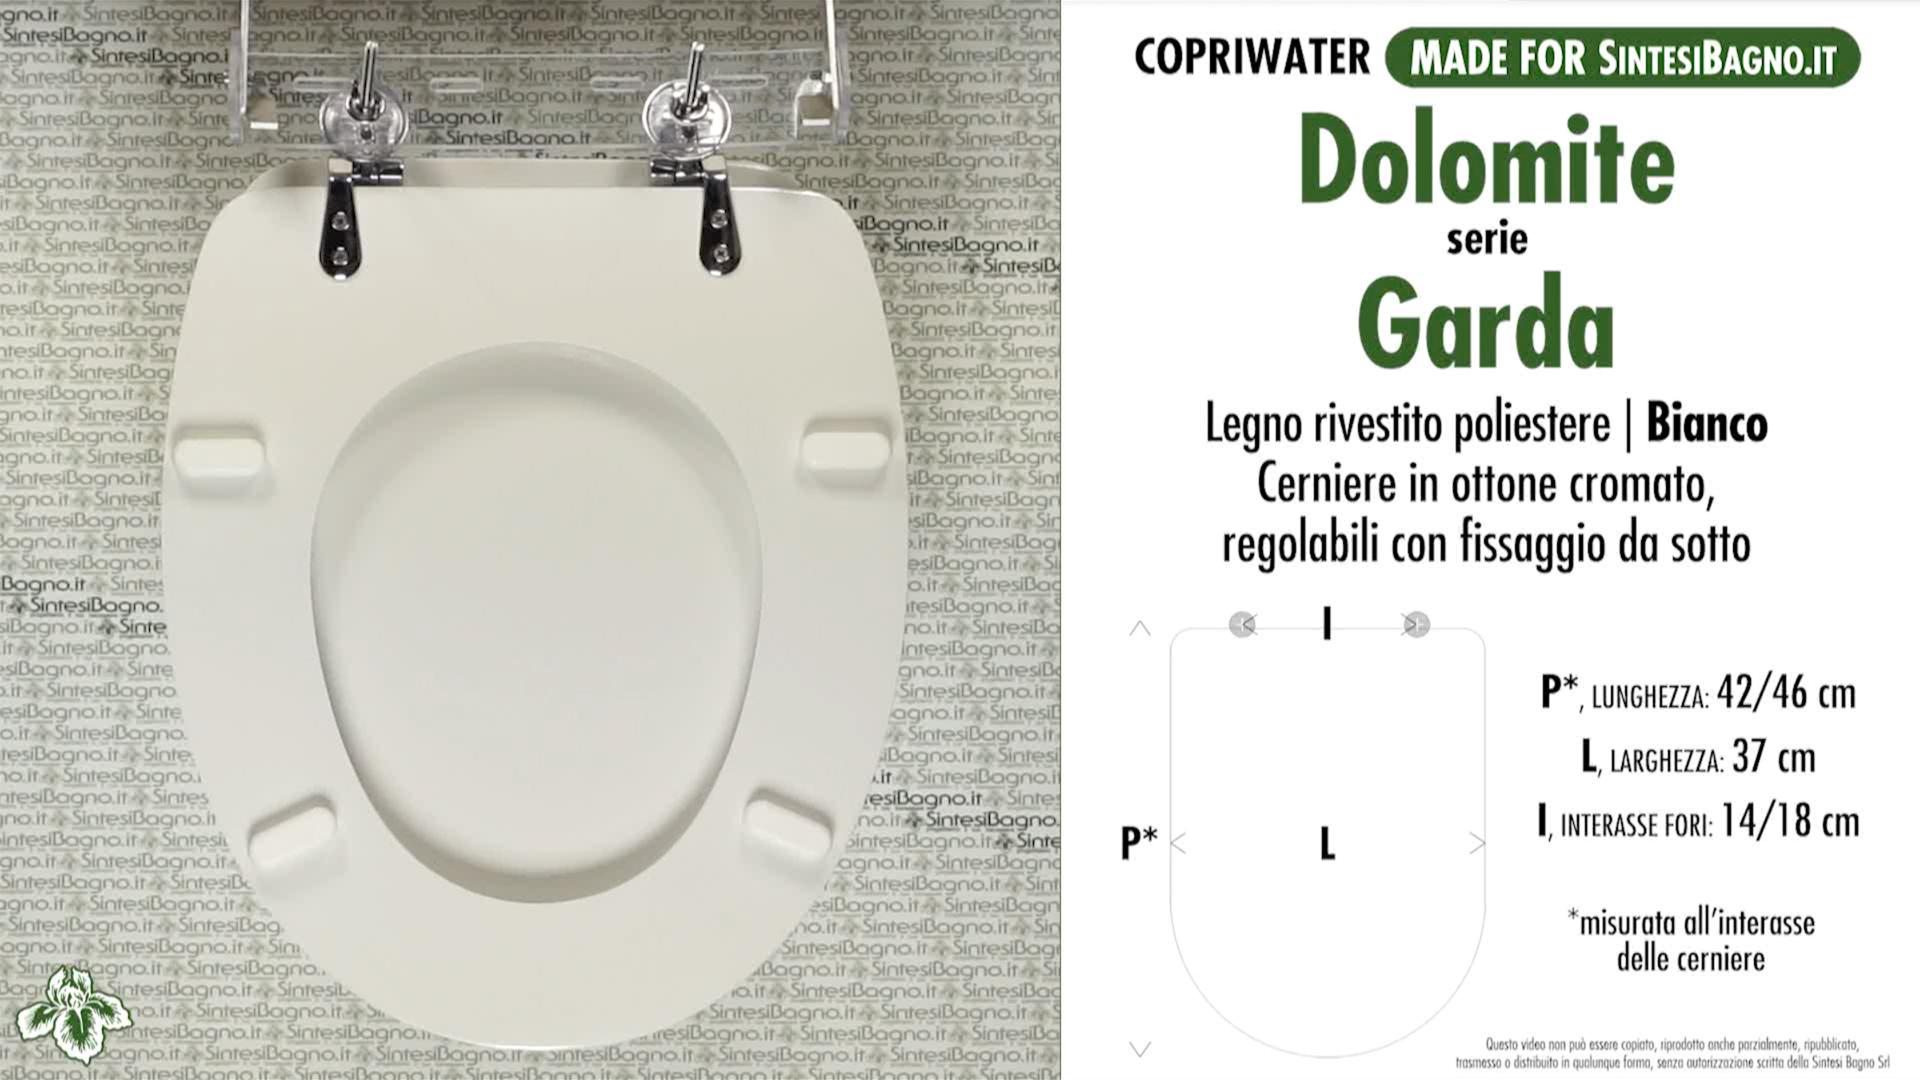 SCHEDA TECNICA MISURE copriwater DOLOMITE GARDA